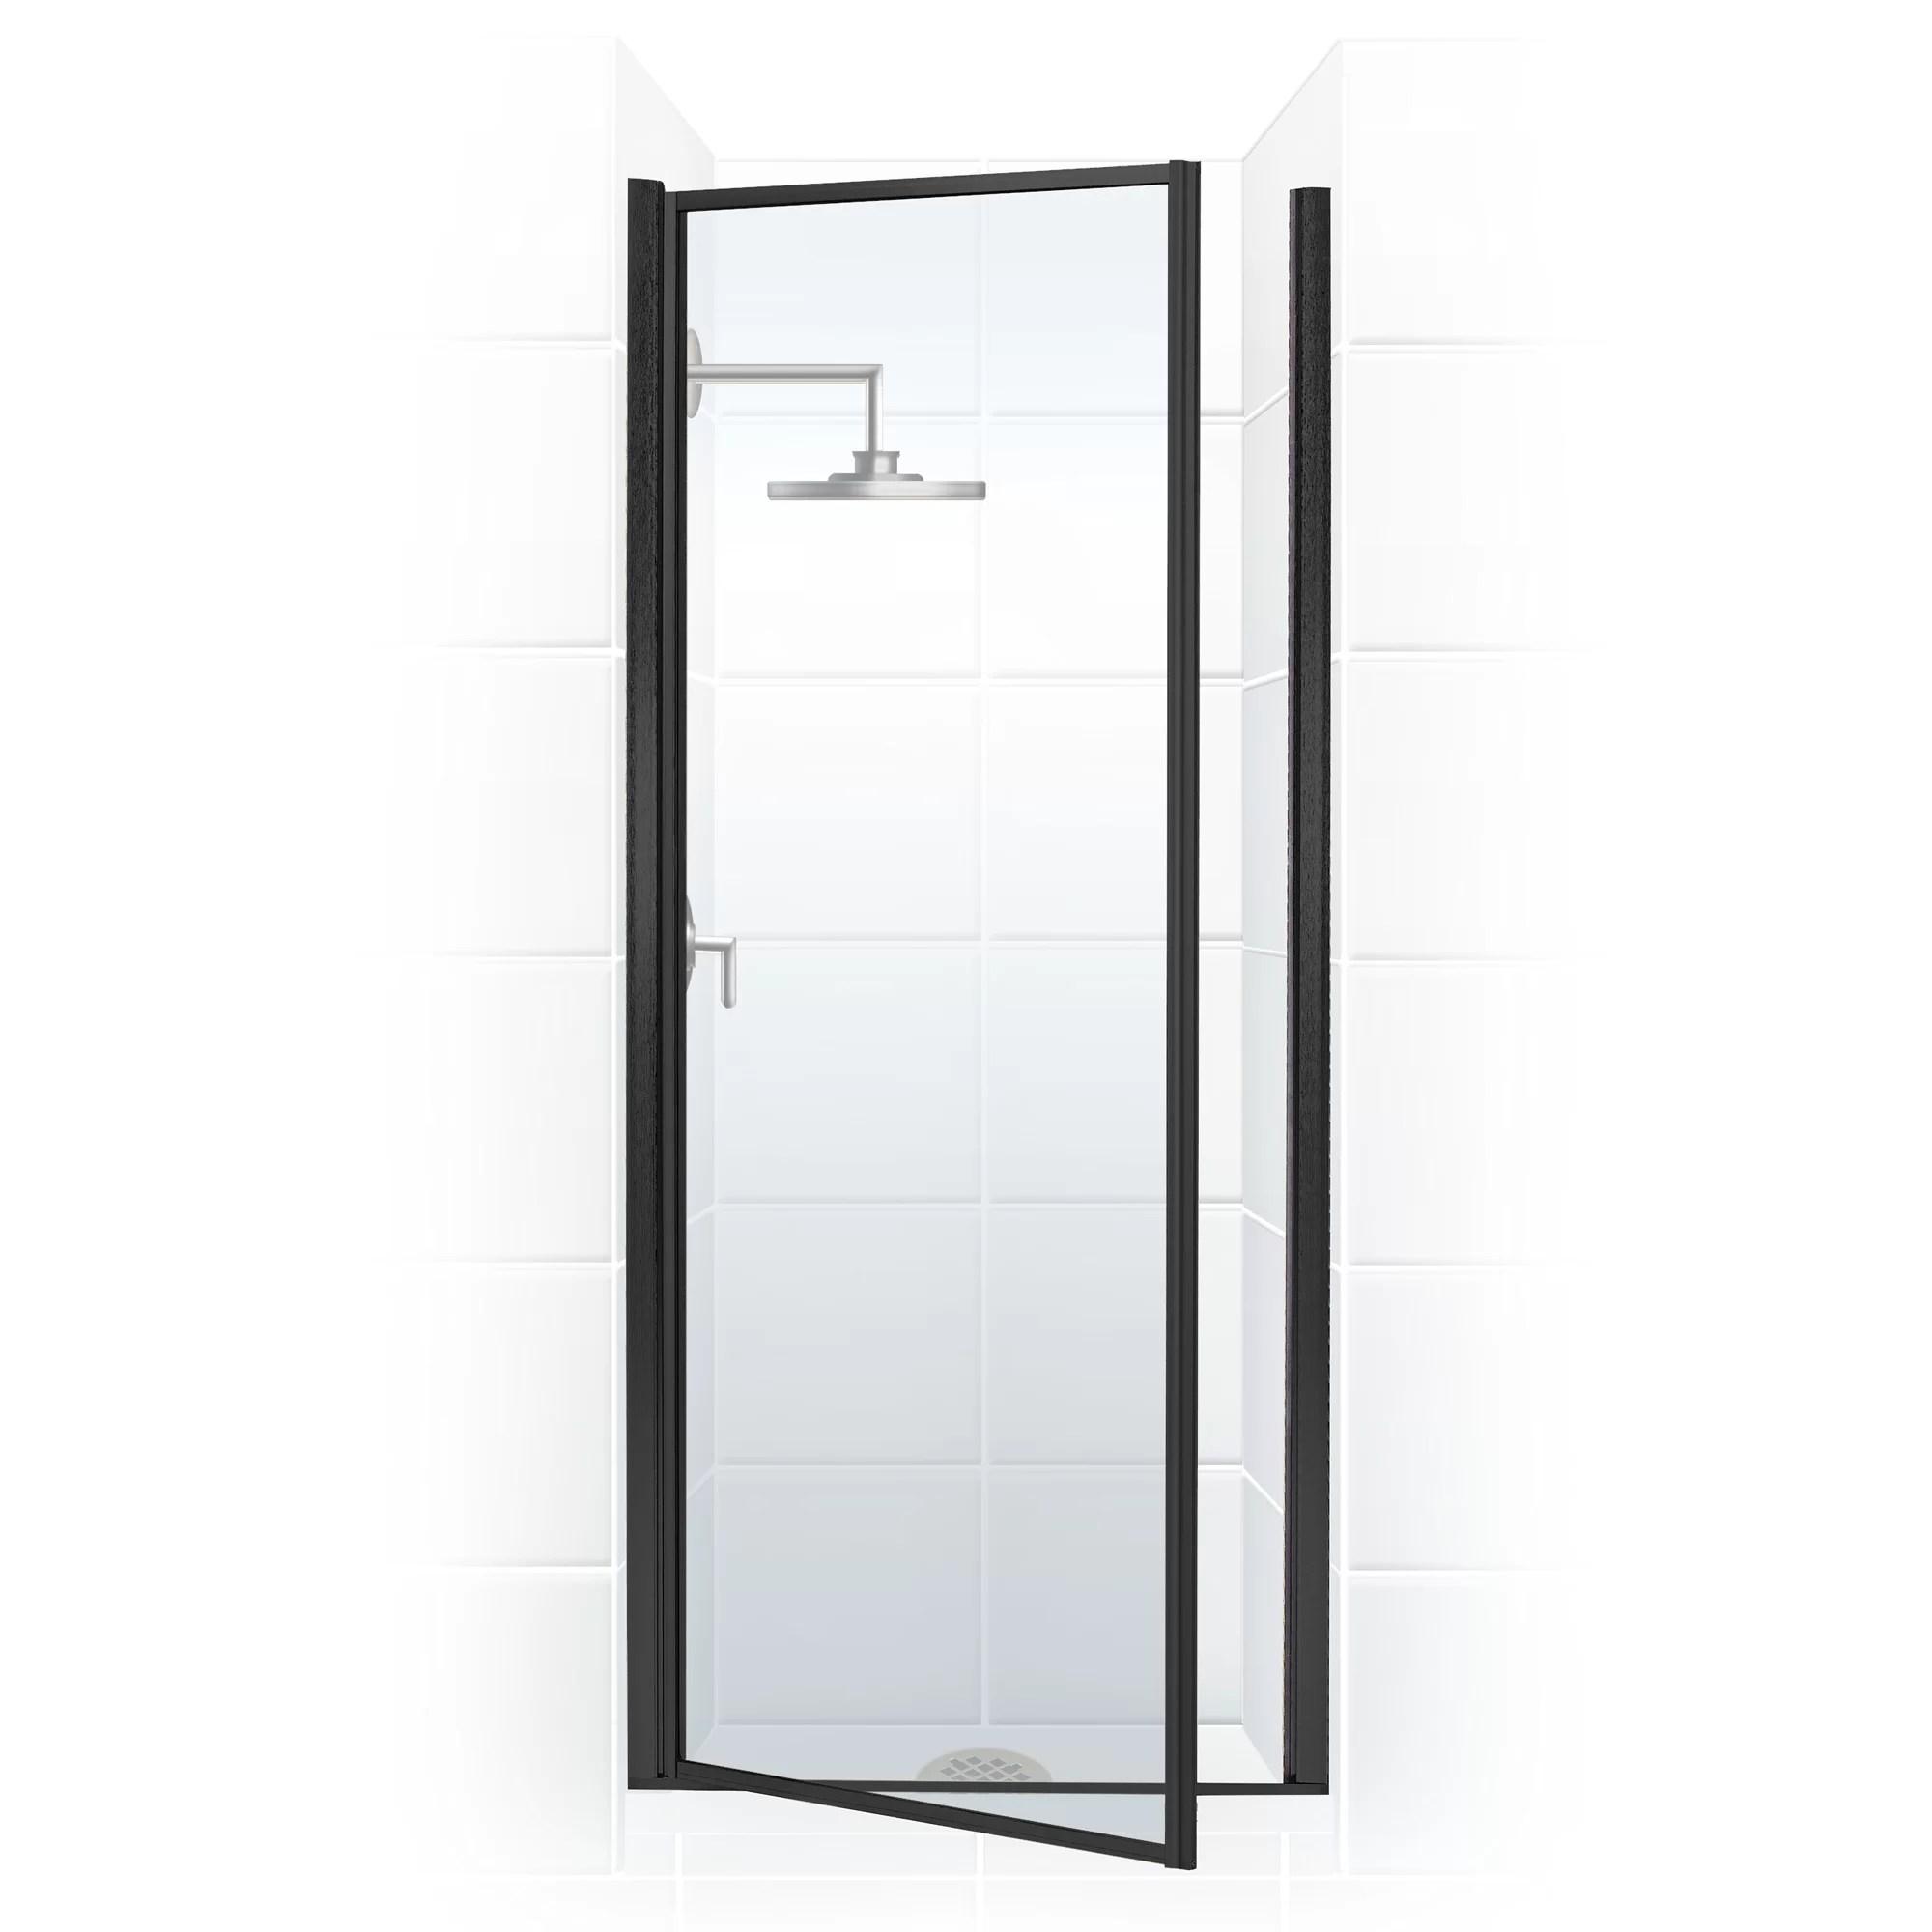 Legend Series 26 X 68 Hinged Framed Shower Door